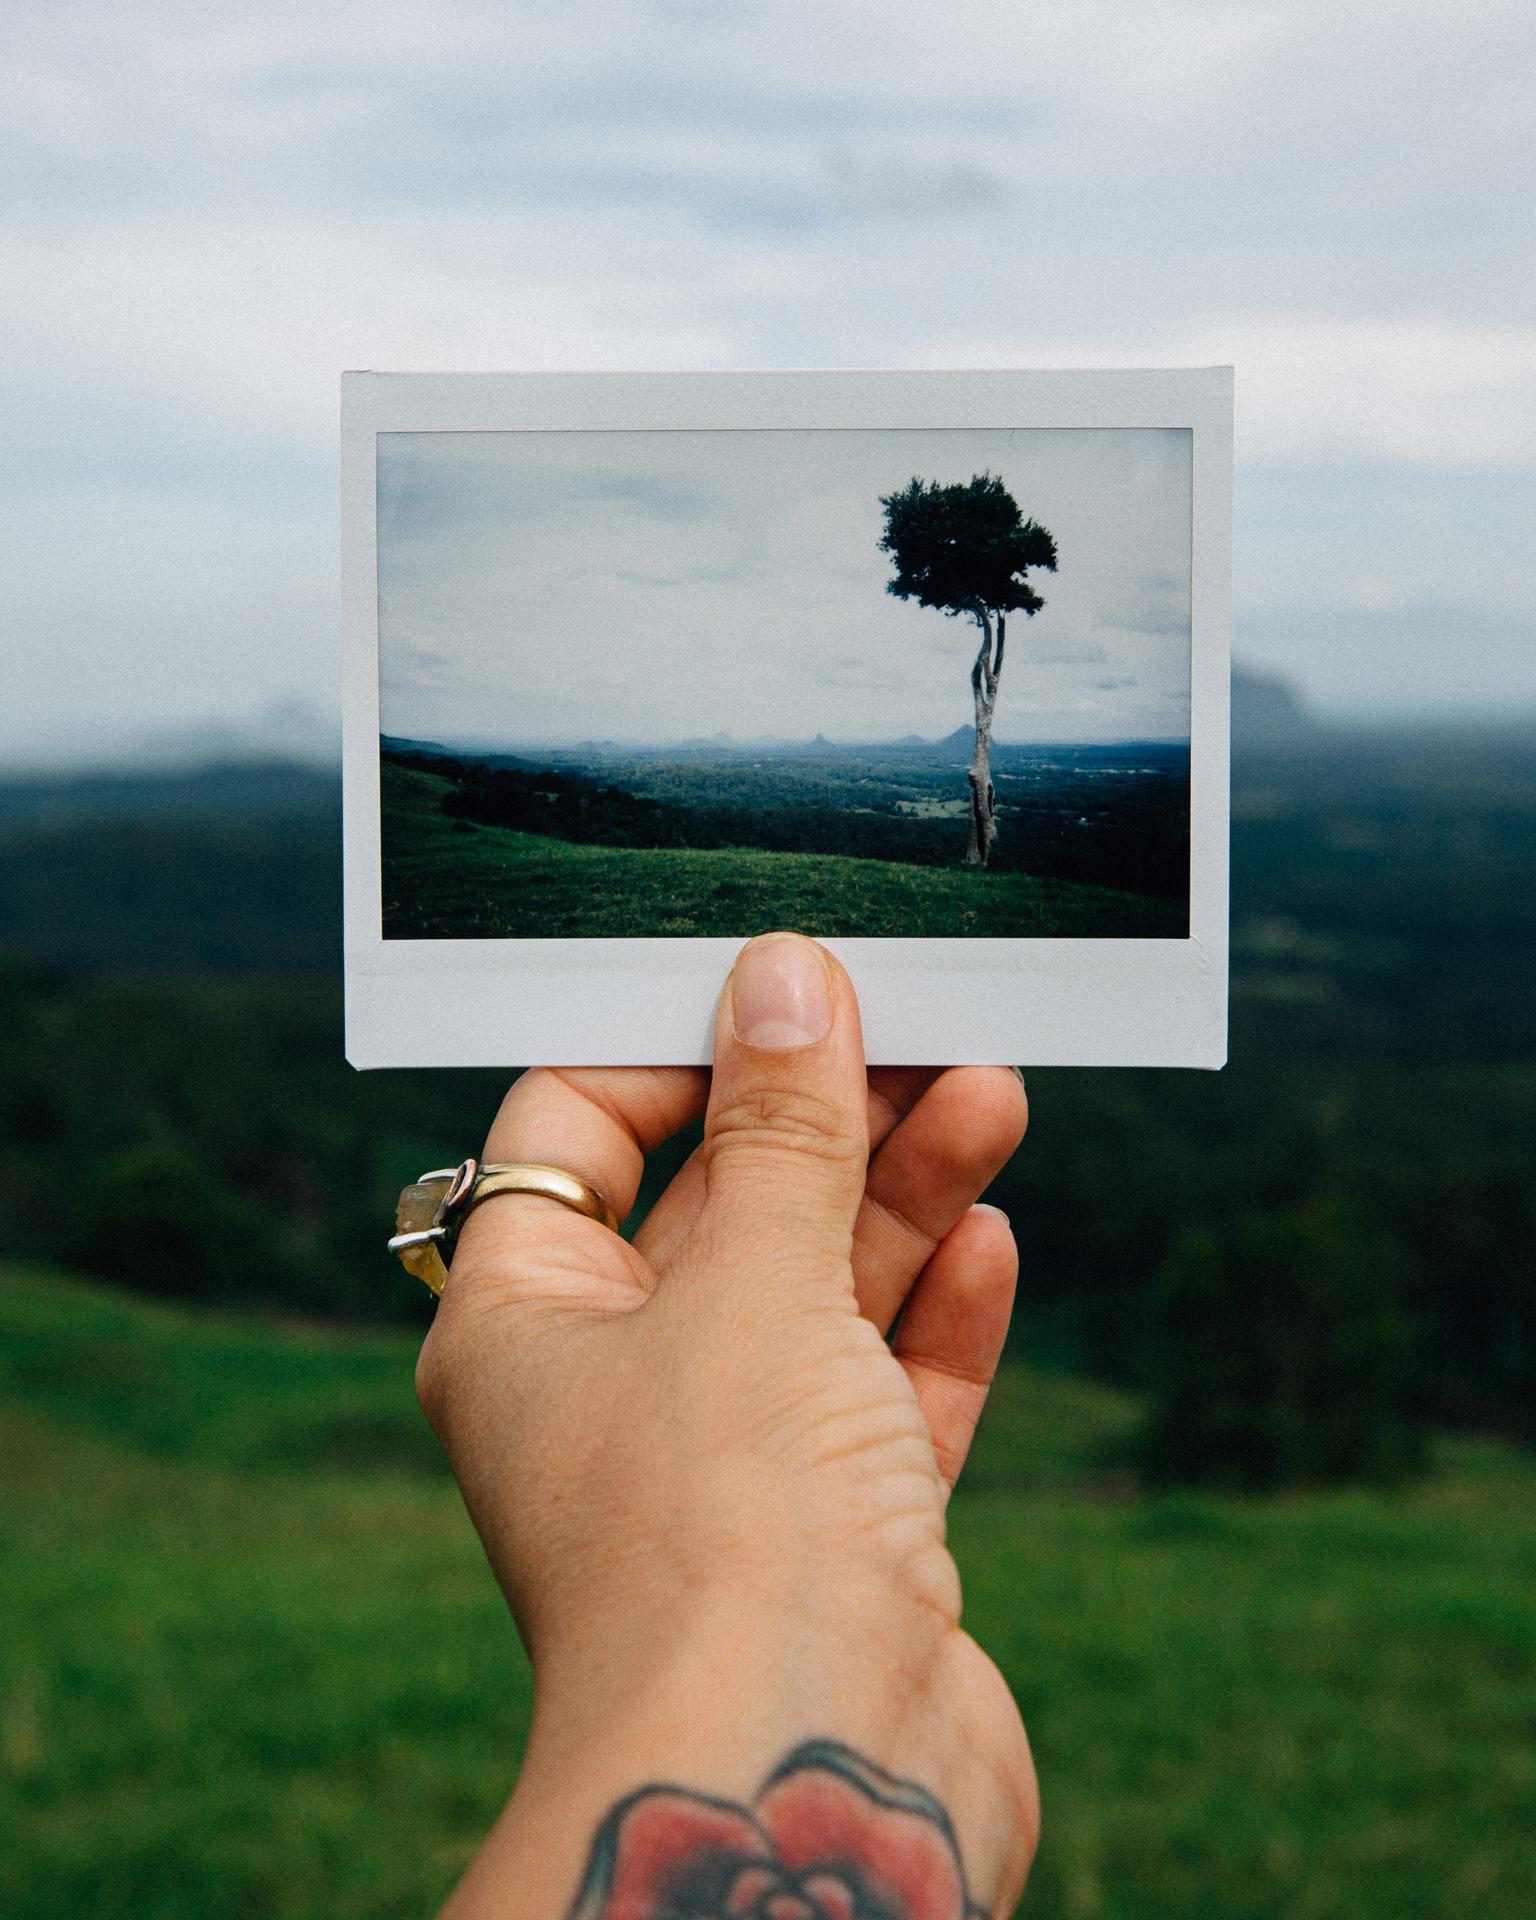 Melissa-Findley-Photographer-Portfolio-INSTANT-16.jpg